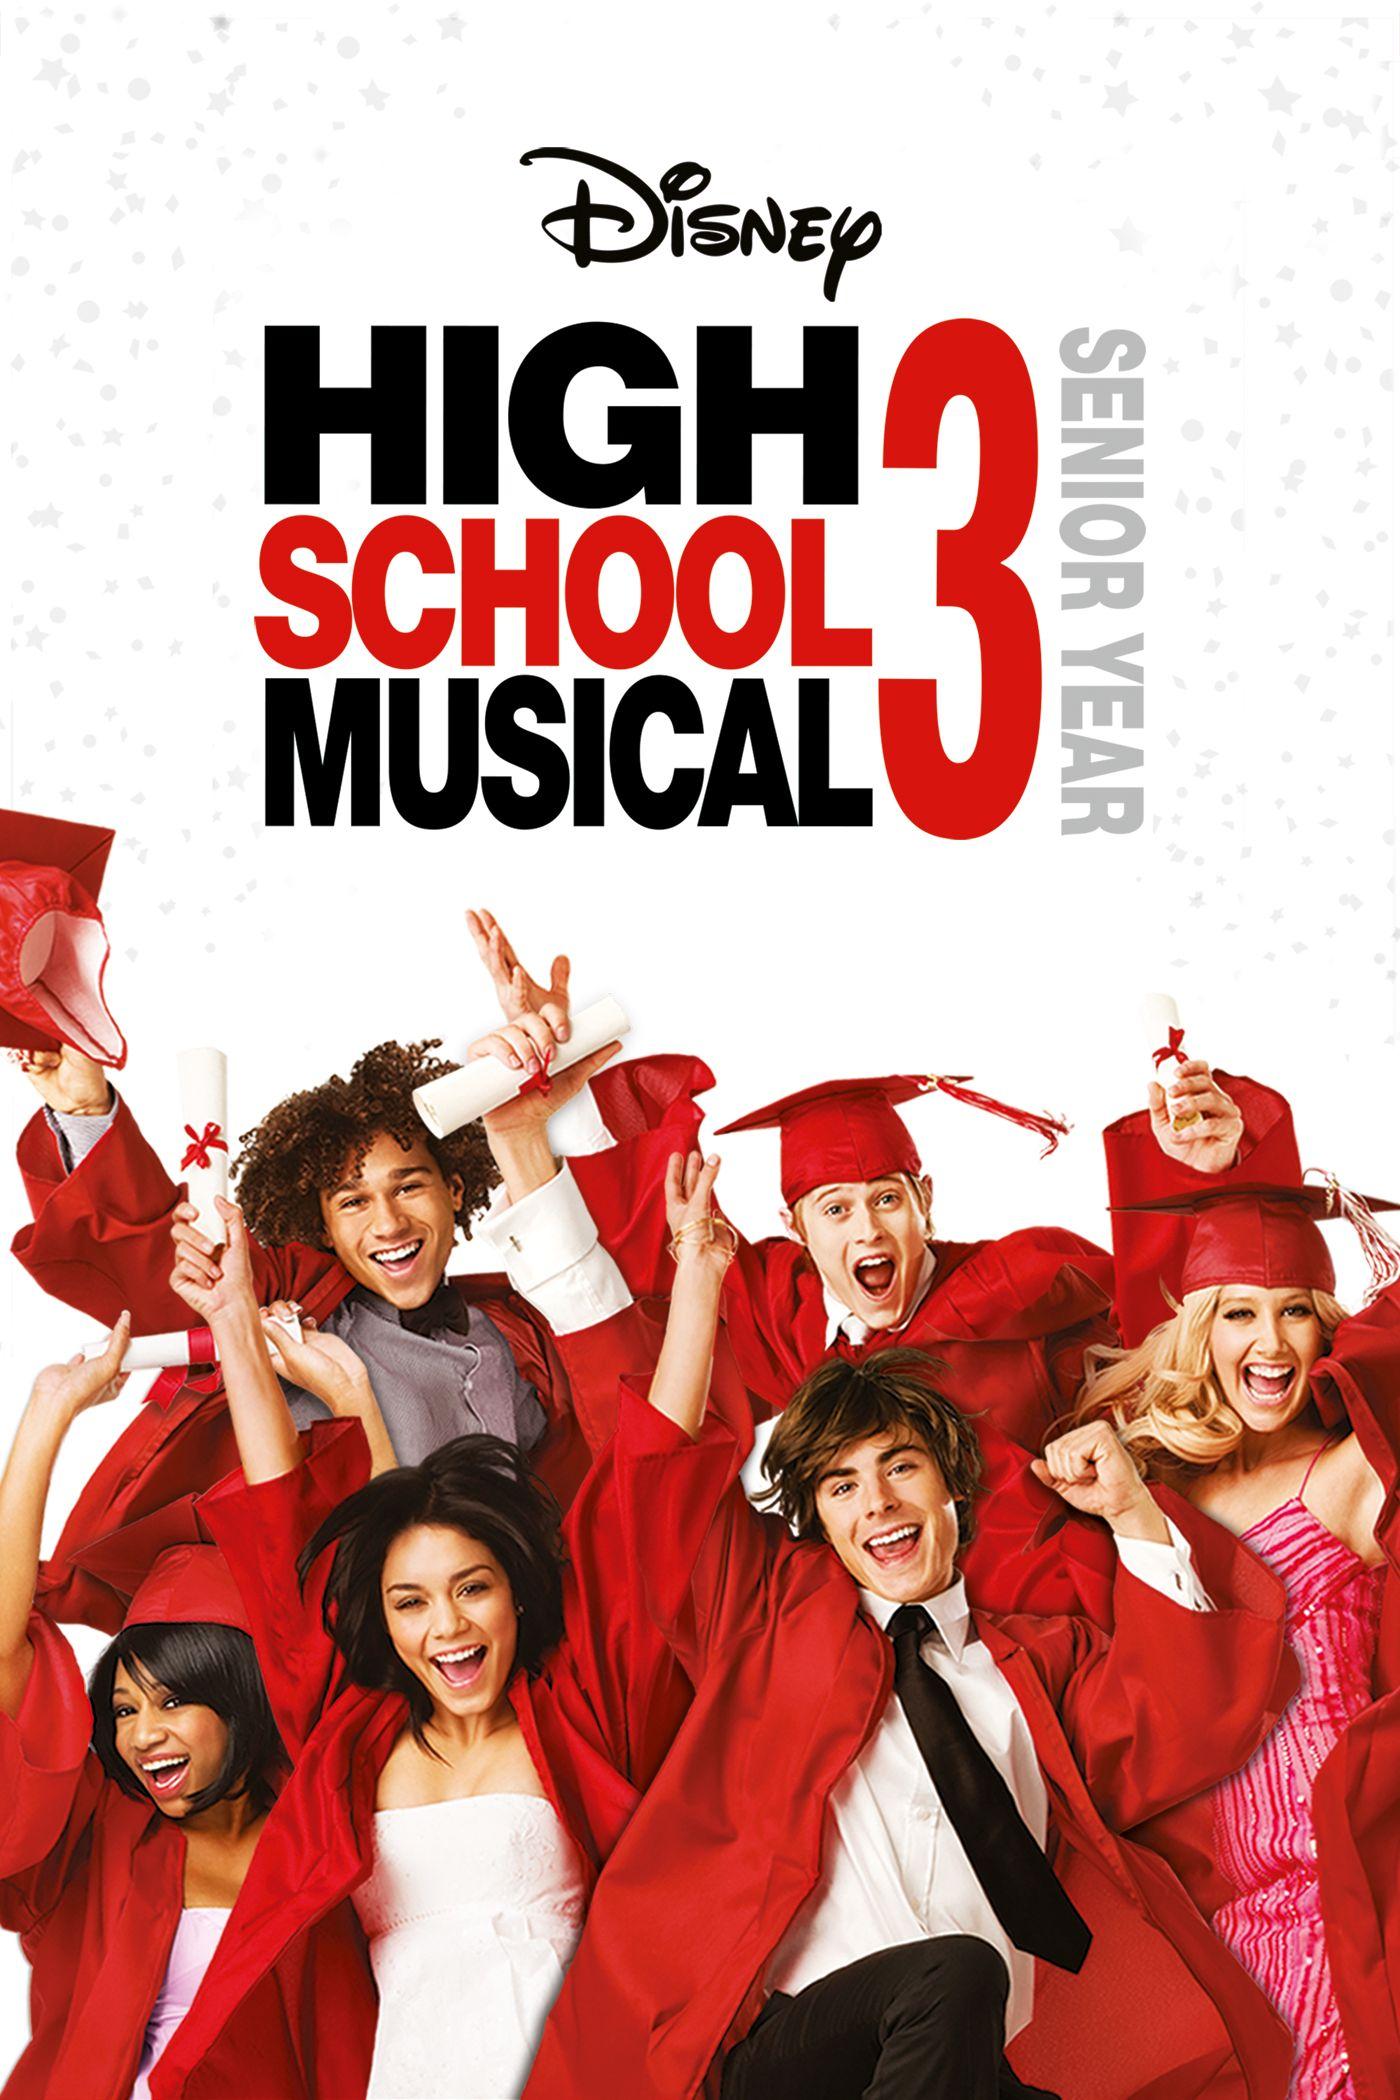 High School Musical 1 Film : school, musical, School, Musical, Senior, Movie, Movies, Anywhere